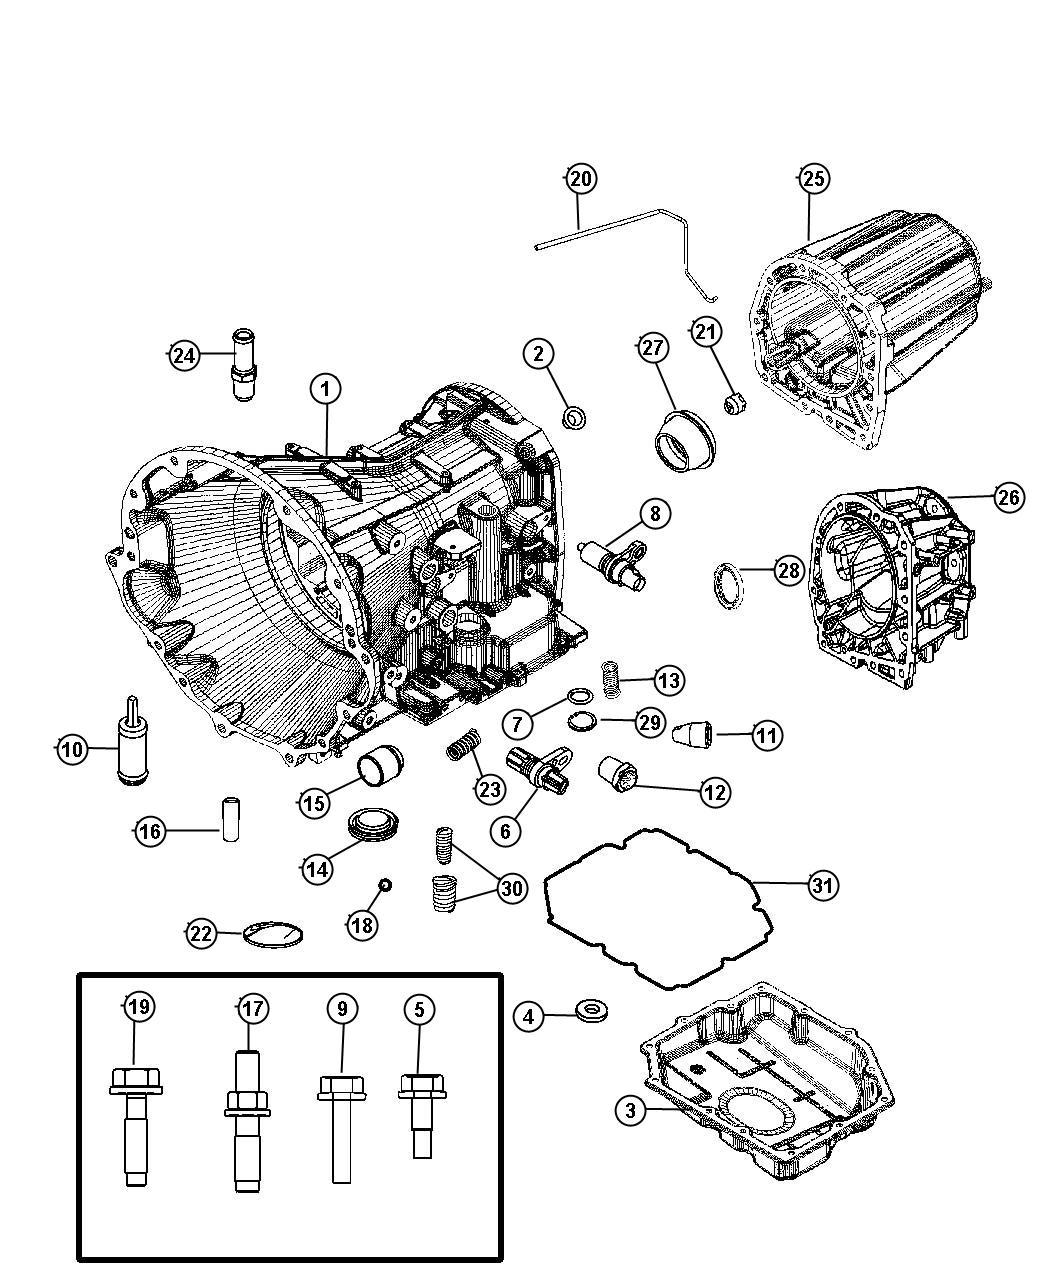 2006 Dodge Magnum R/T 5.7L Hemi V8 Fitting, fitting kit